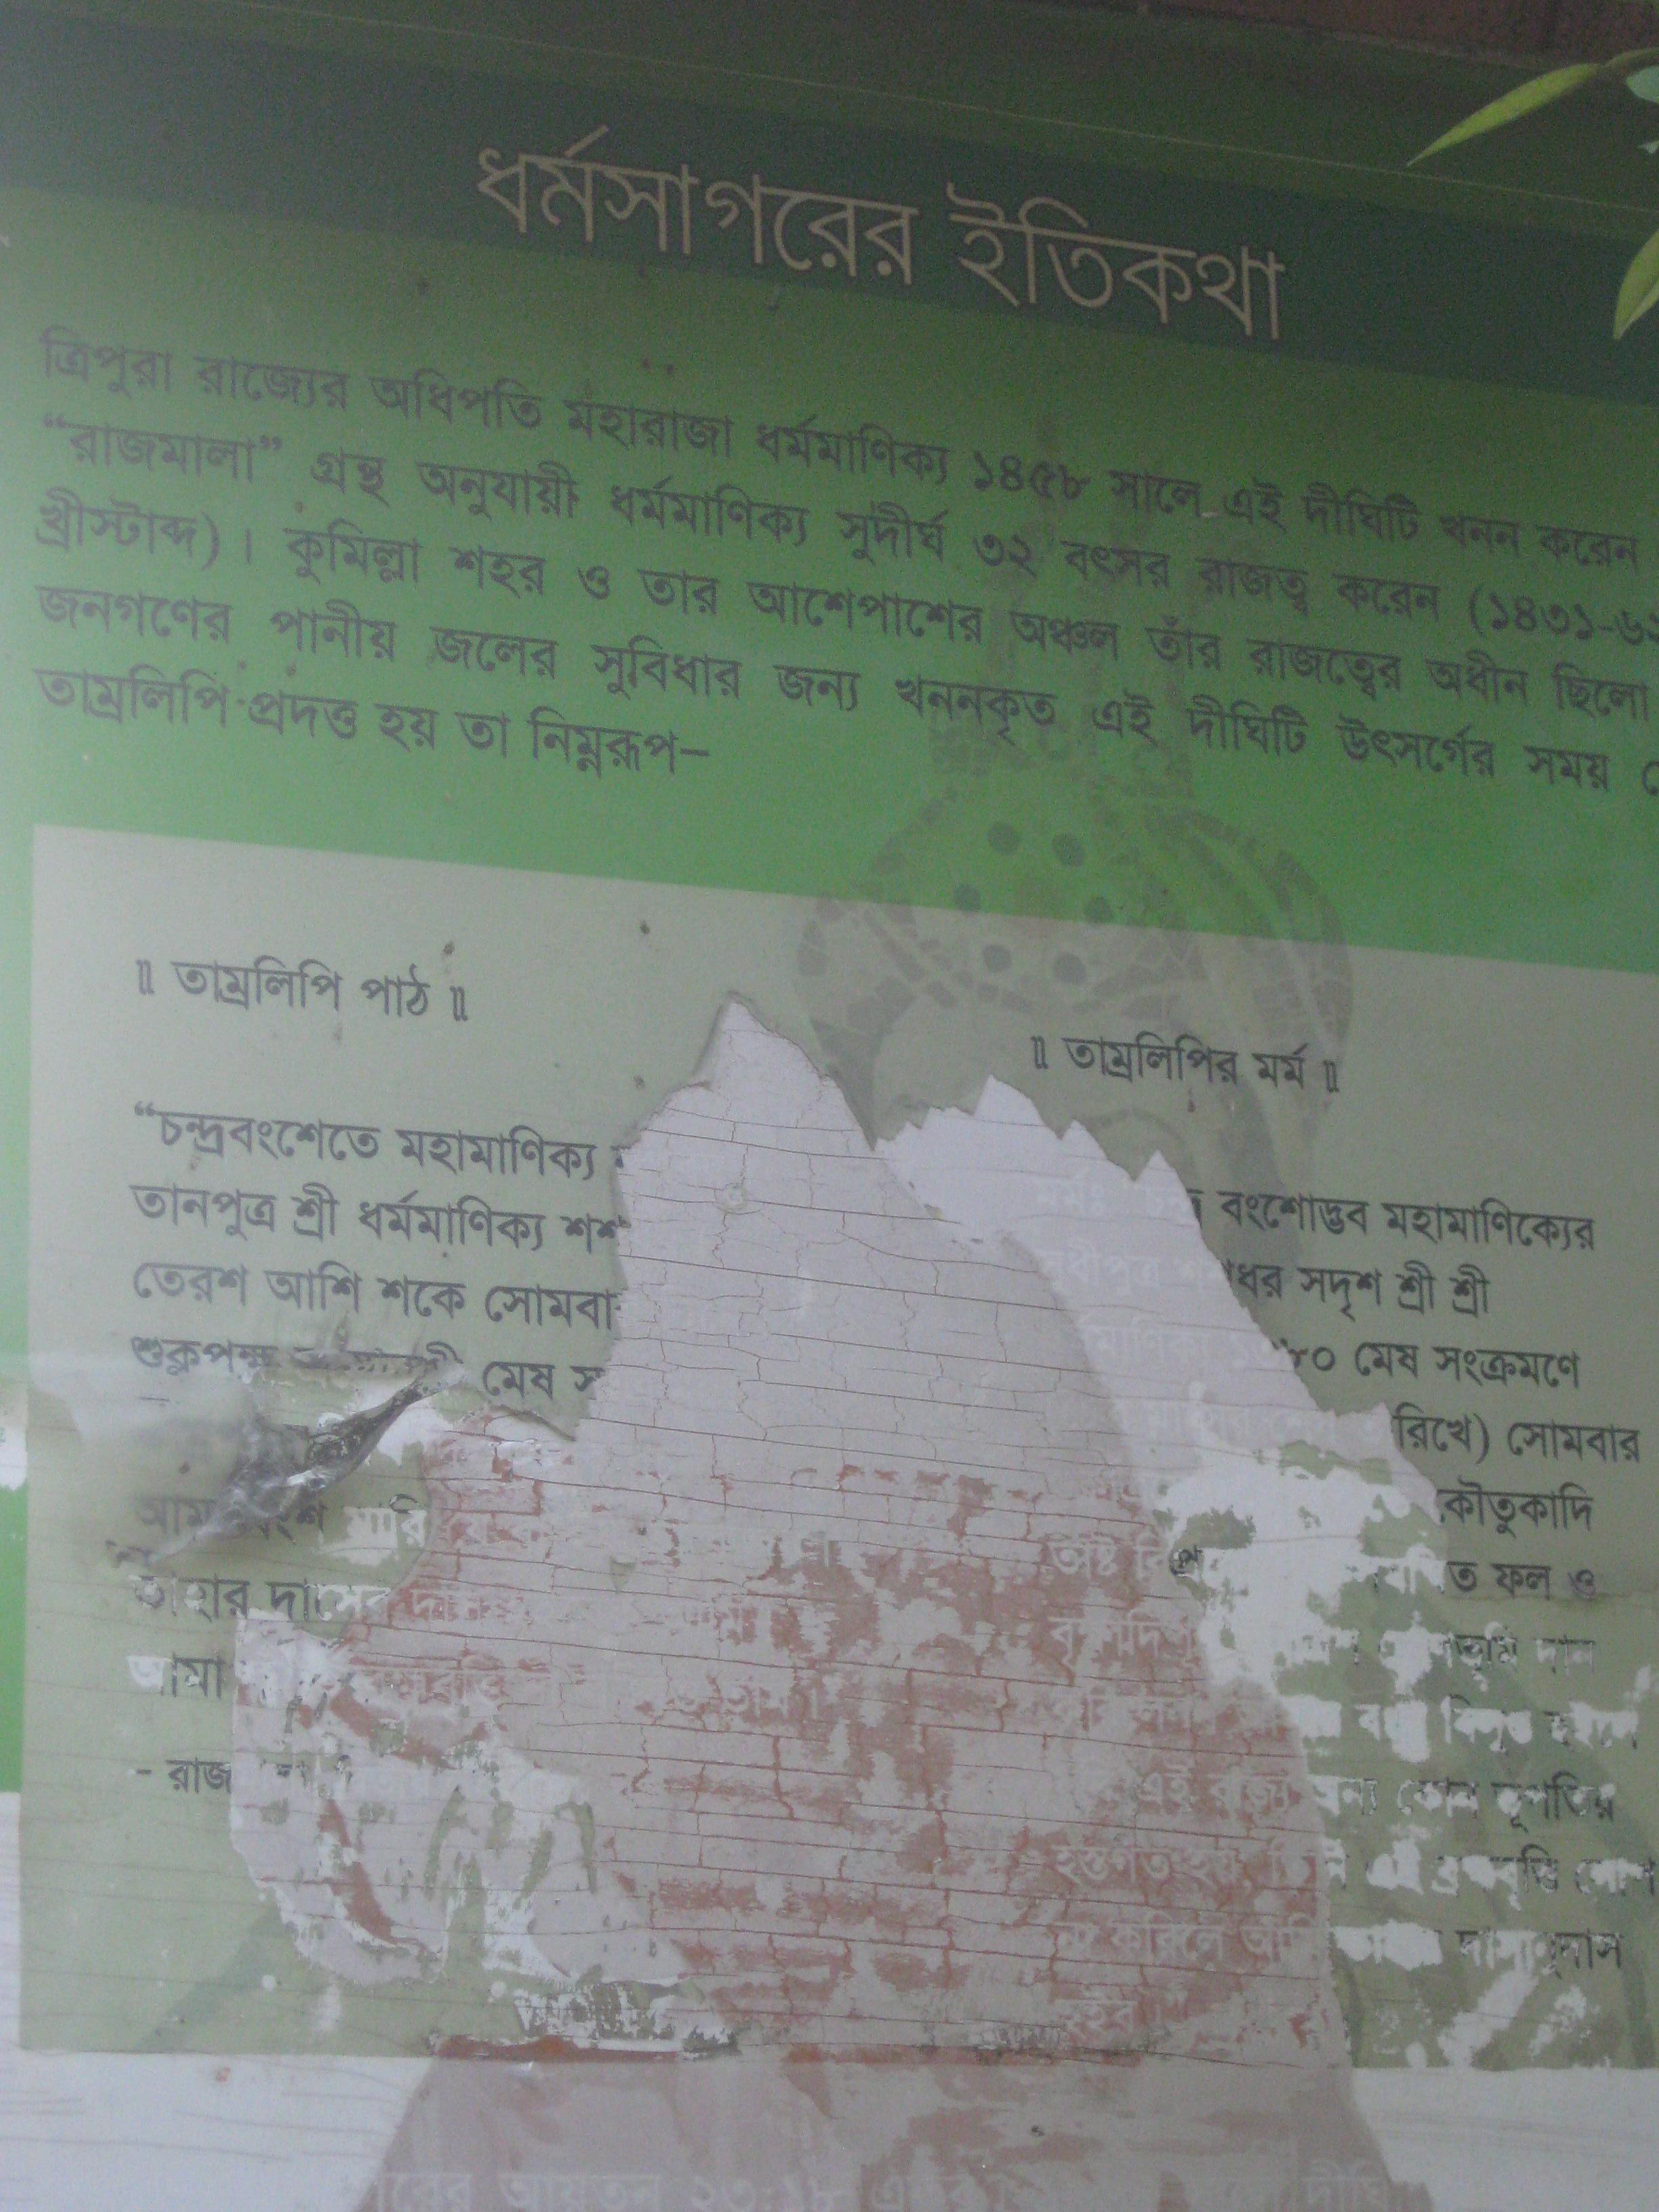 File:Nameplate describing the history of Dharmasagar Pond in Bangla